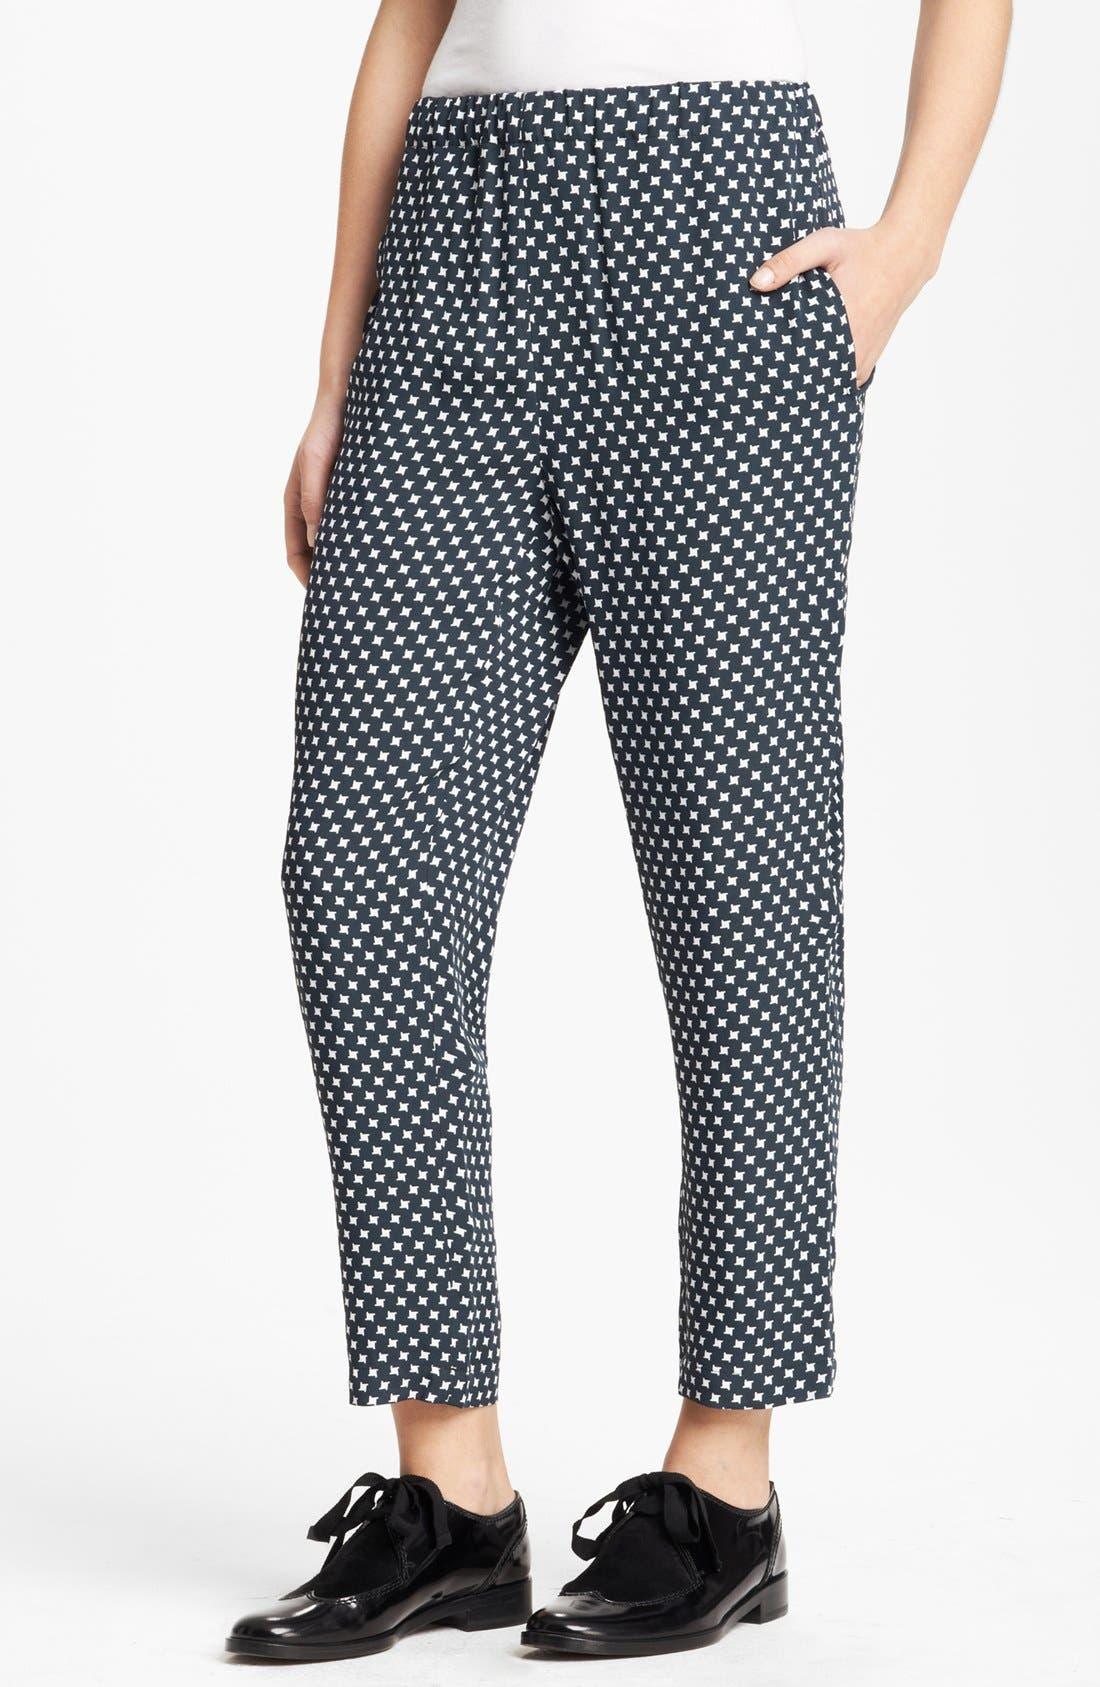 Alternate Image 1 Selected - Marni Houndstooth Print Crop Pants